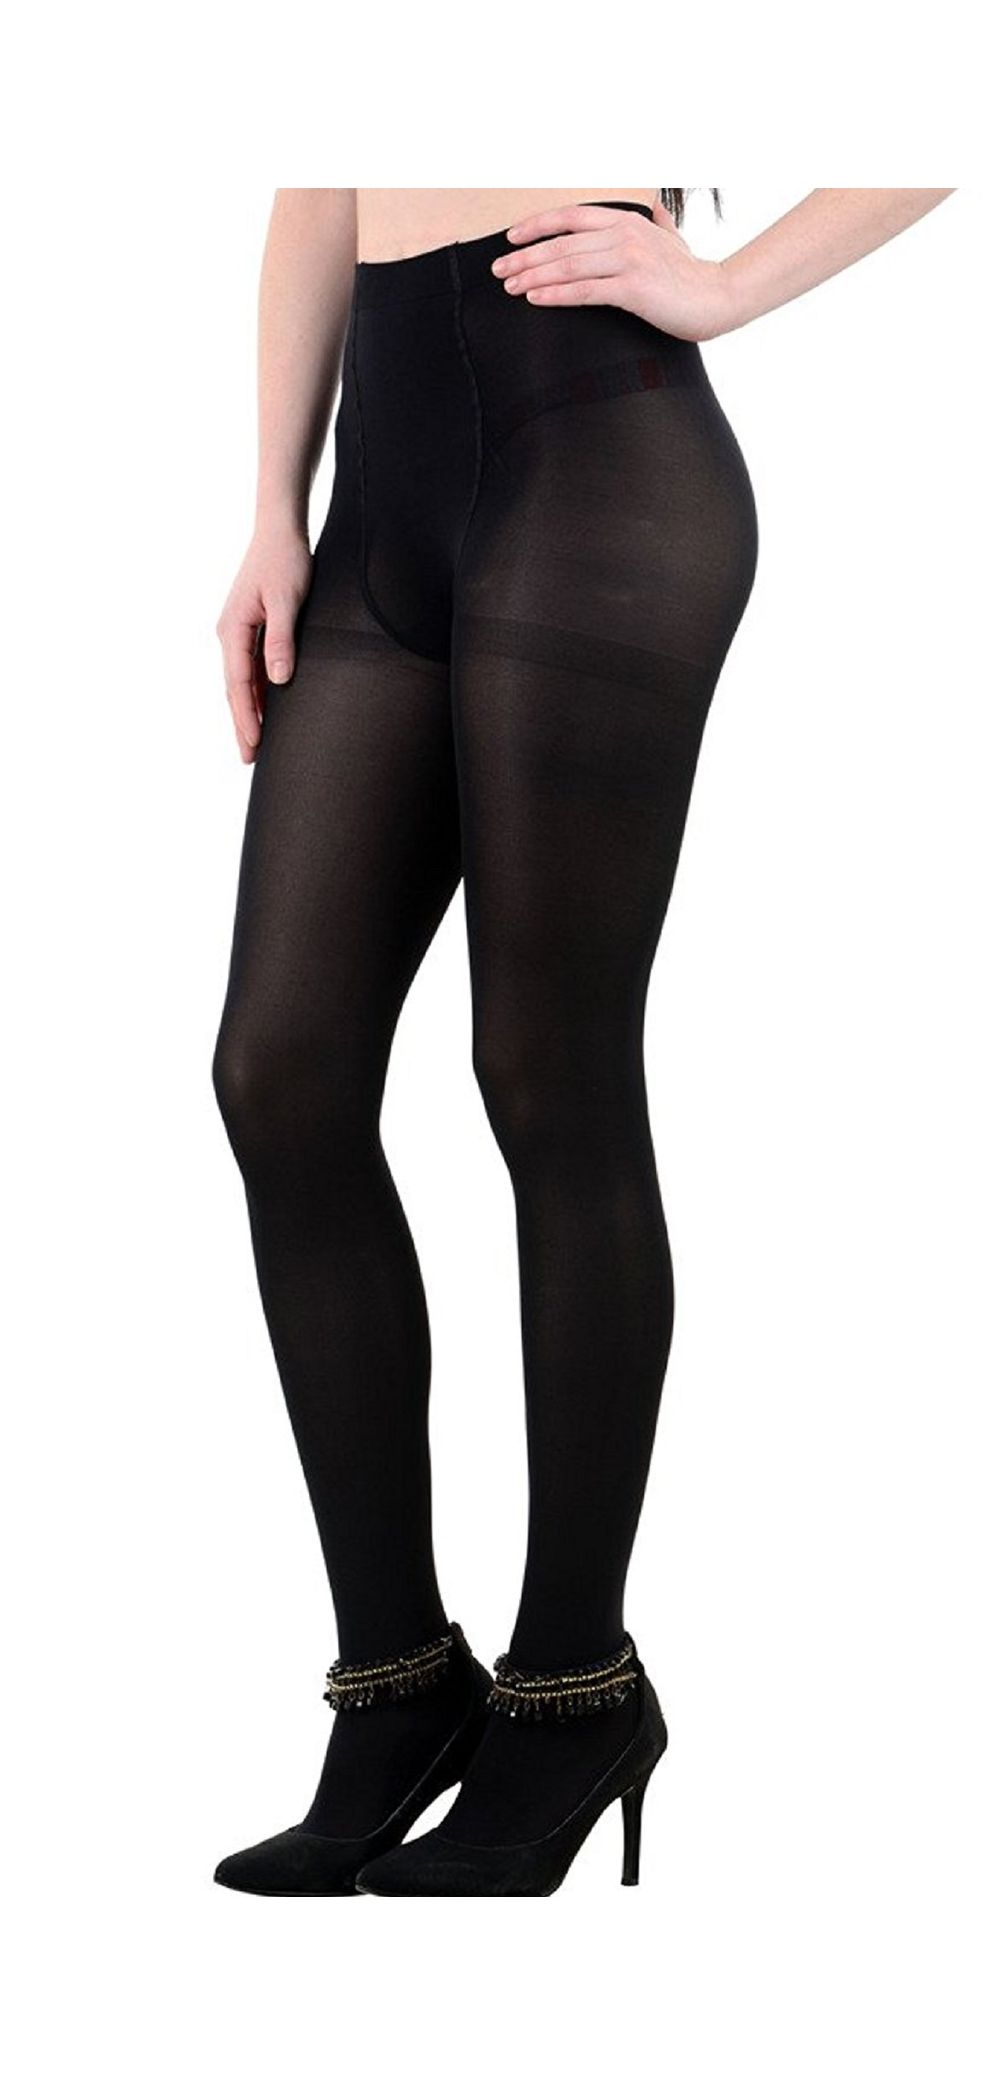 Pantyhose and stocking pics